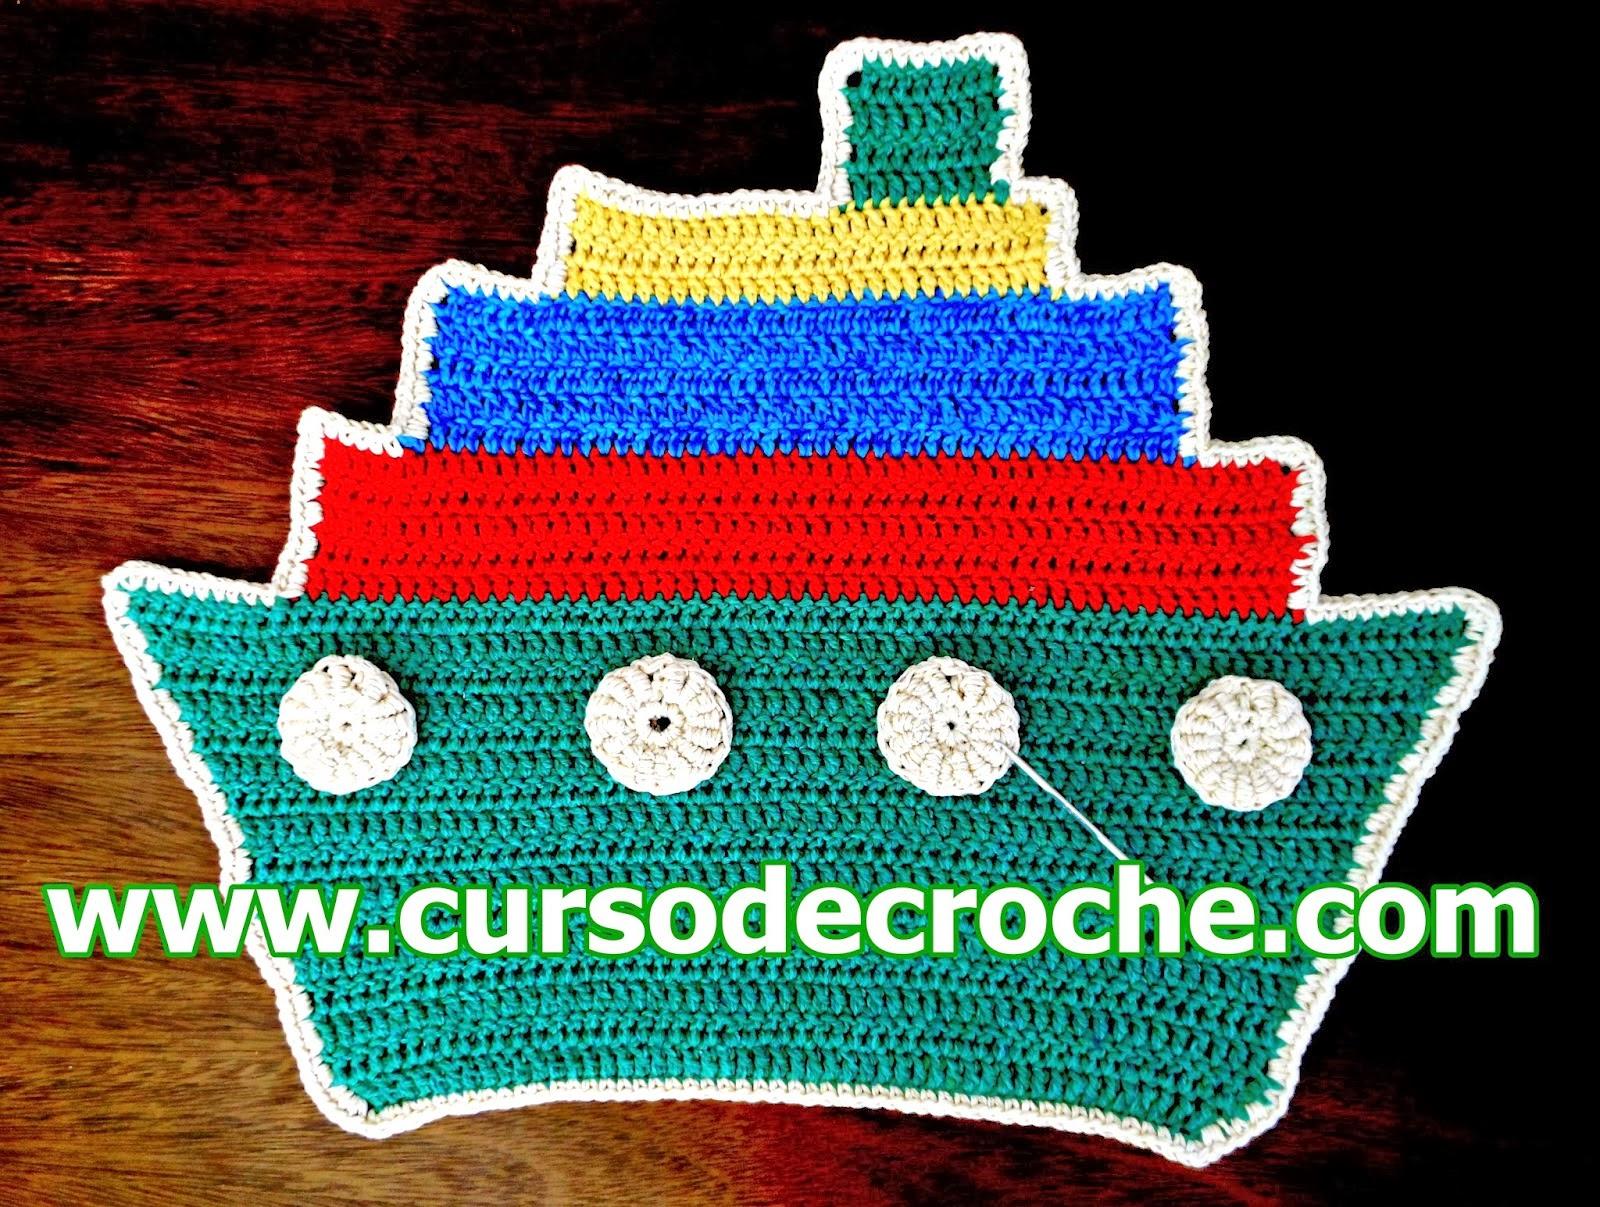 dvd video-aulas aprender croche tapetes loja curso de croche frete gratis edinir-croche